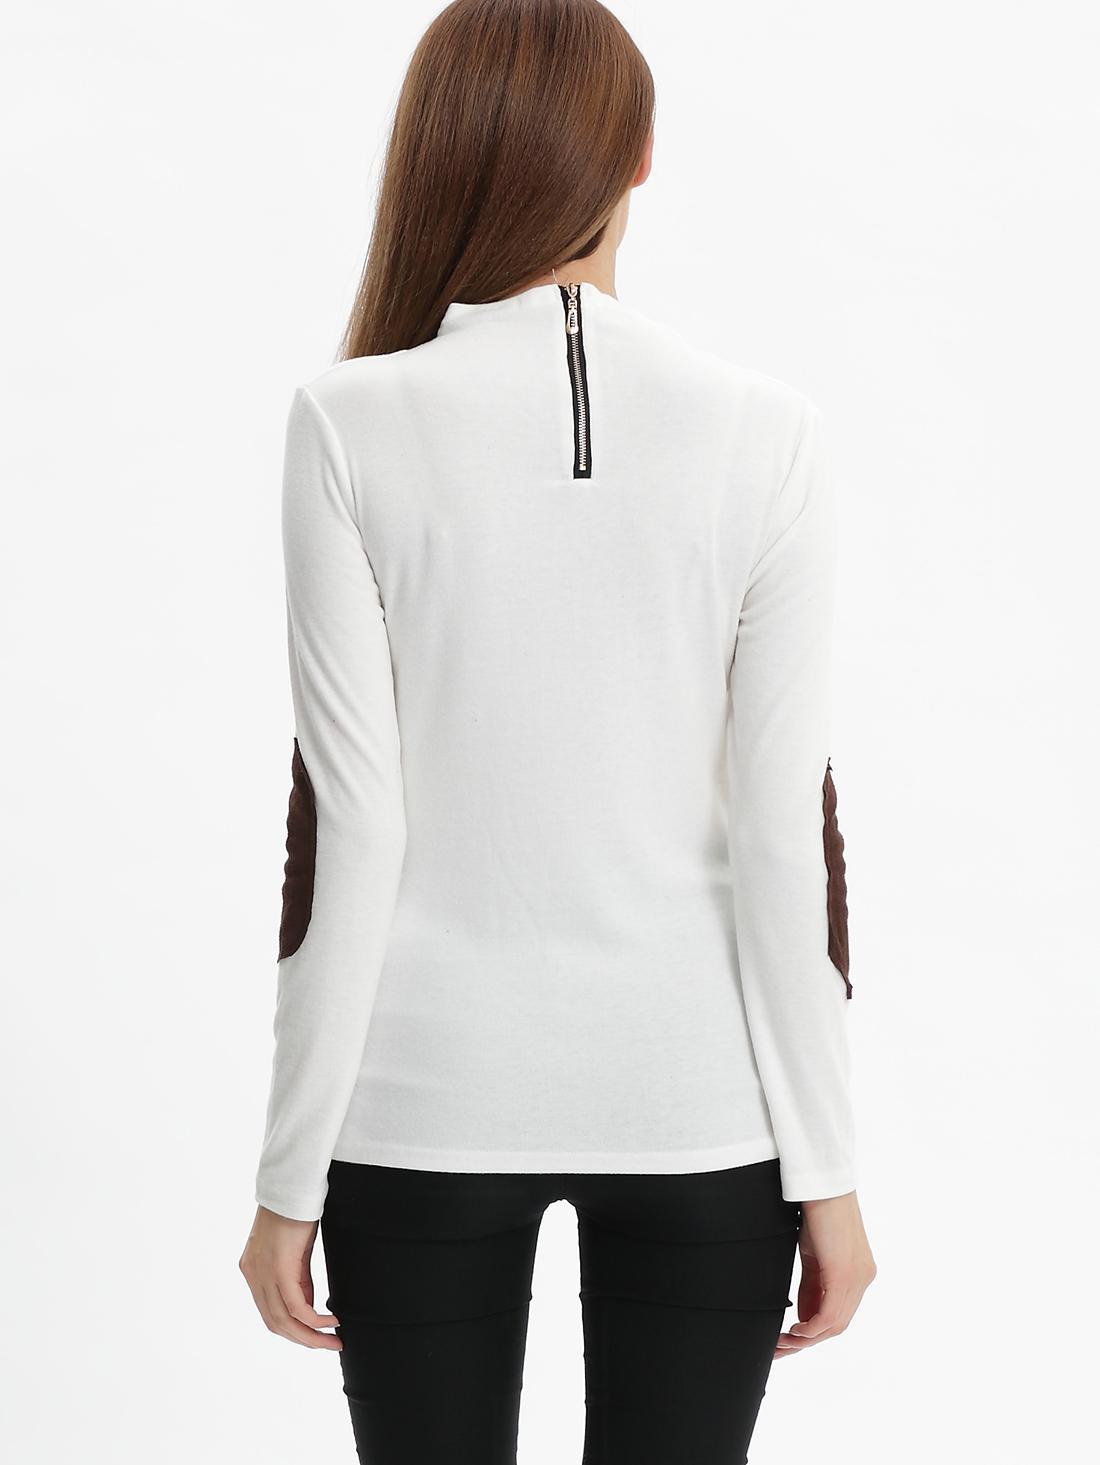 Unique Bargains Men Slim Fit Lightweight Long Sleeve Pullover Top Turtleneck T-shirt. Sold by Unique Bargains + 1. $ State Cashmere Men's % Pure Cashmere Turtleneck Long Sleeve Pullover Sweater. Sold by State Cashmere. $ - $ $ - $